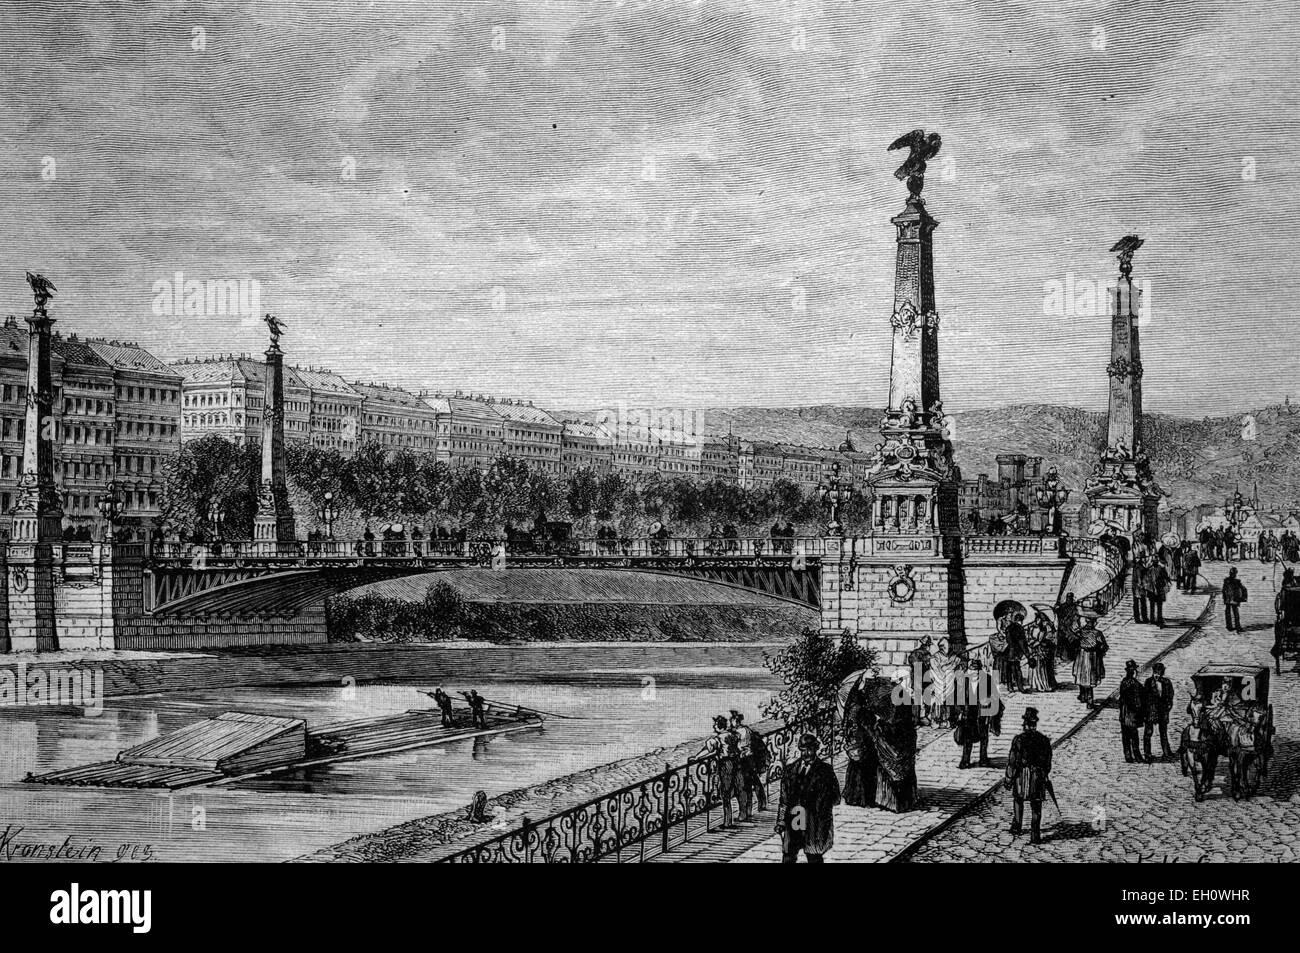 Stefaniebruecke bridge across the Danube Canal in Vienna, Austria, historical illlustration, about 1886 - Stock Image